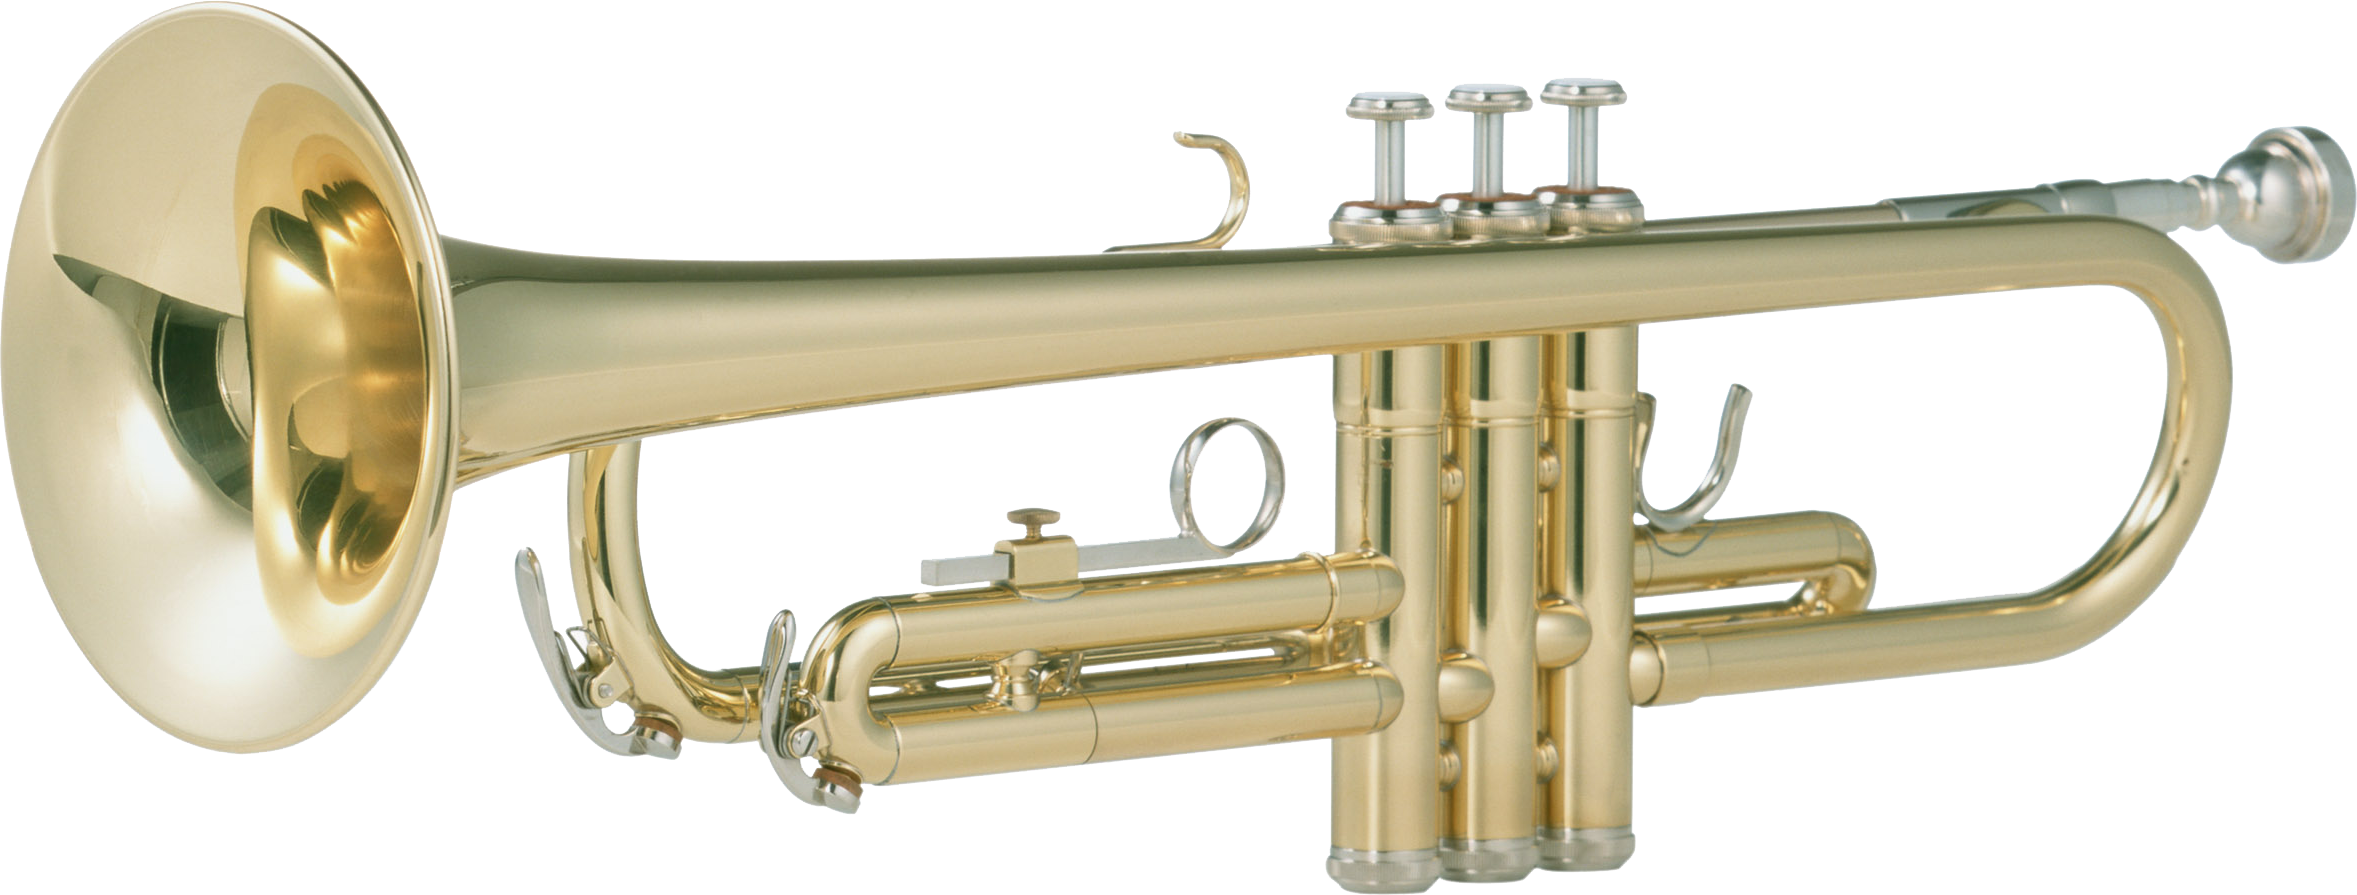 Trumpet PNG images free download, Saxophone PNG